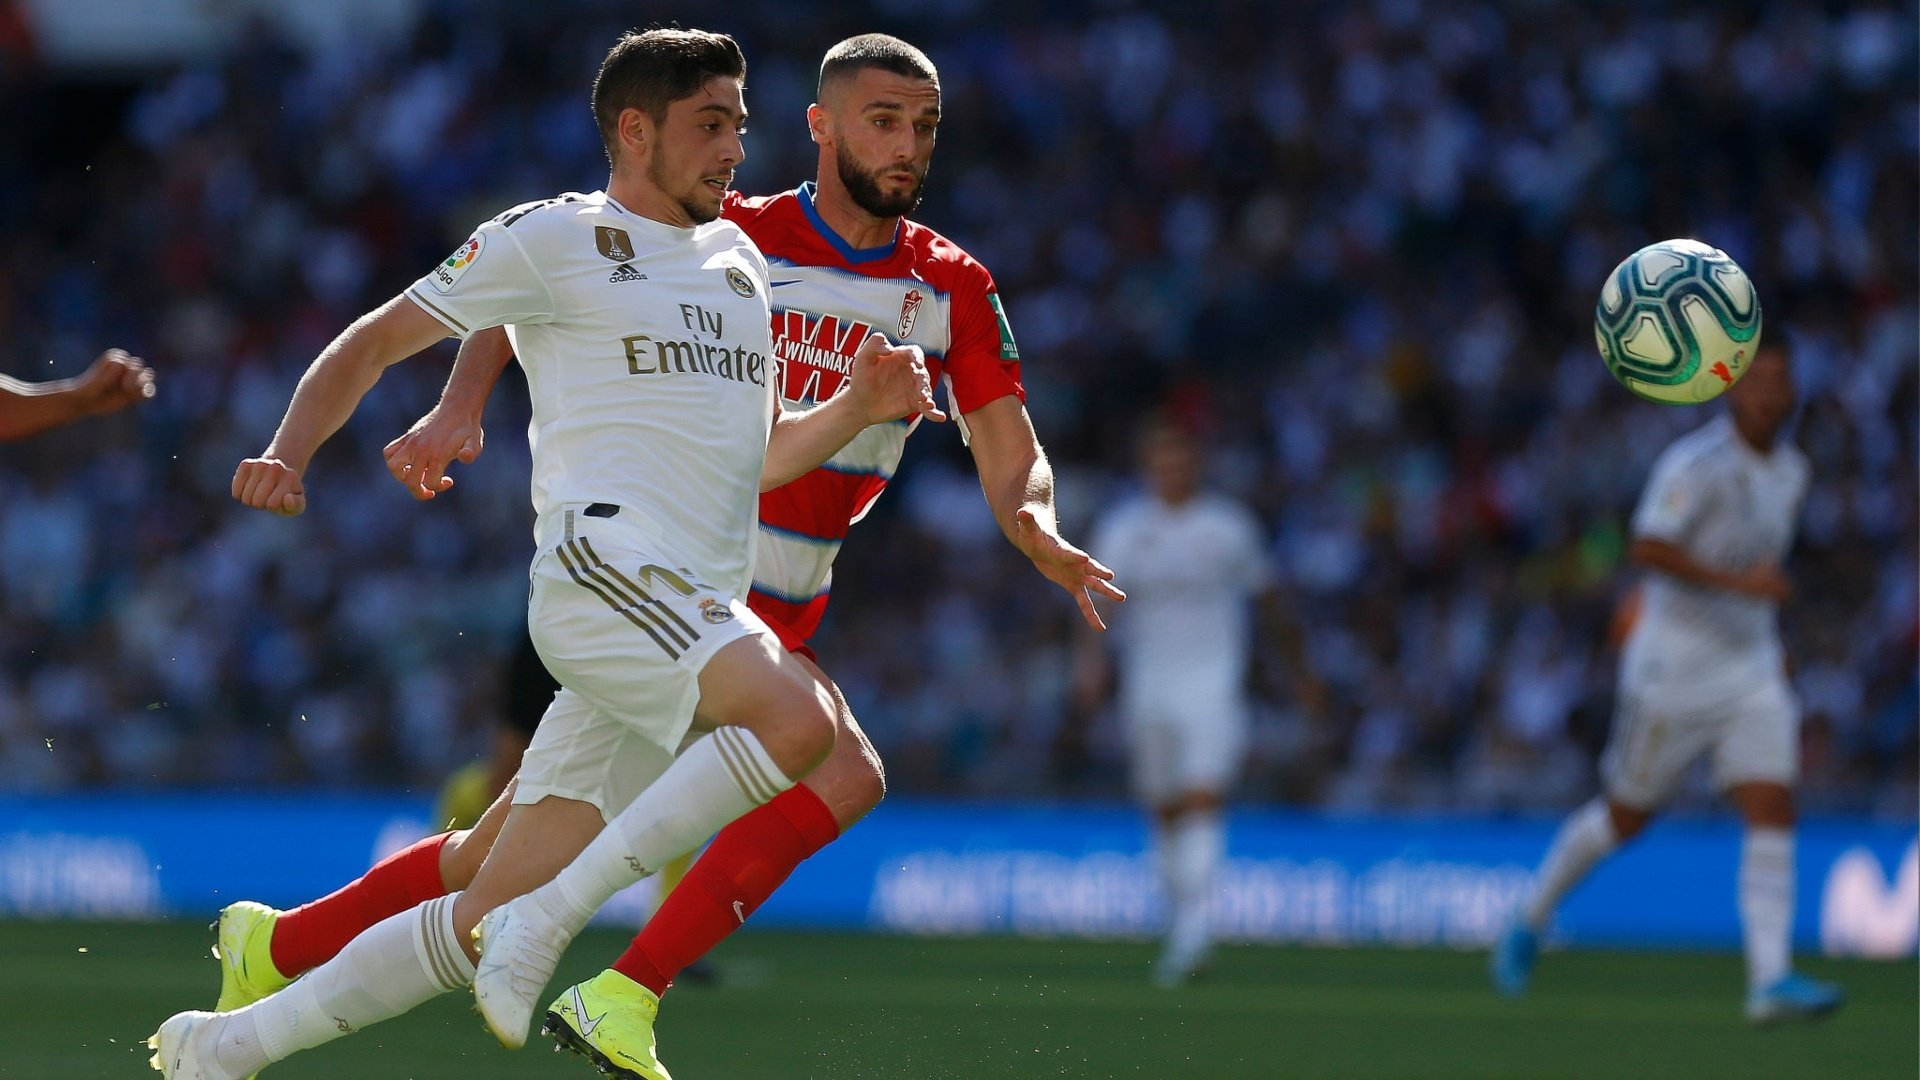 Carvajal & Valverde react to victory over Granada